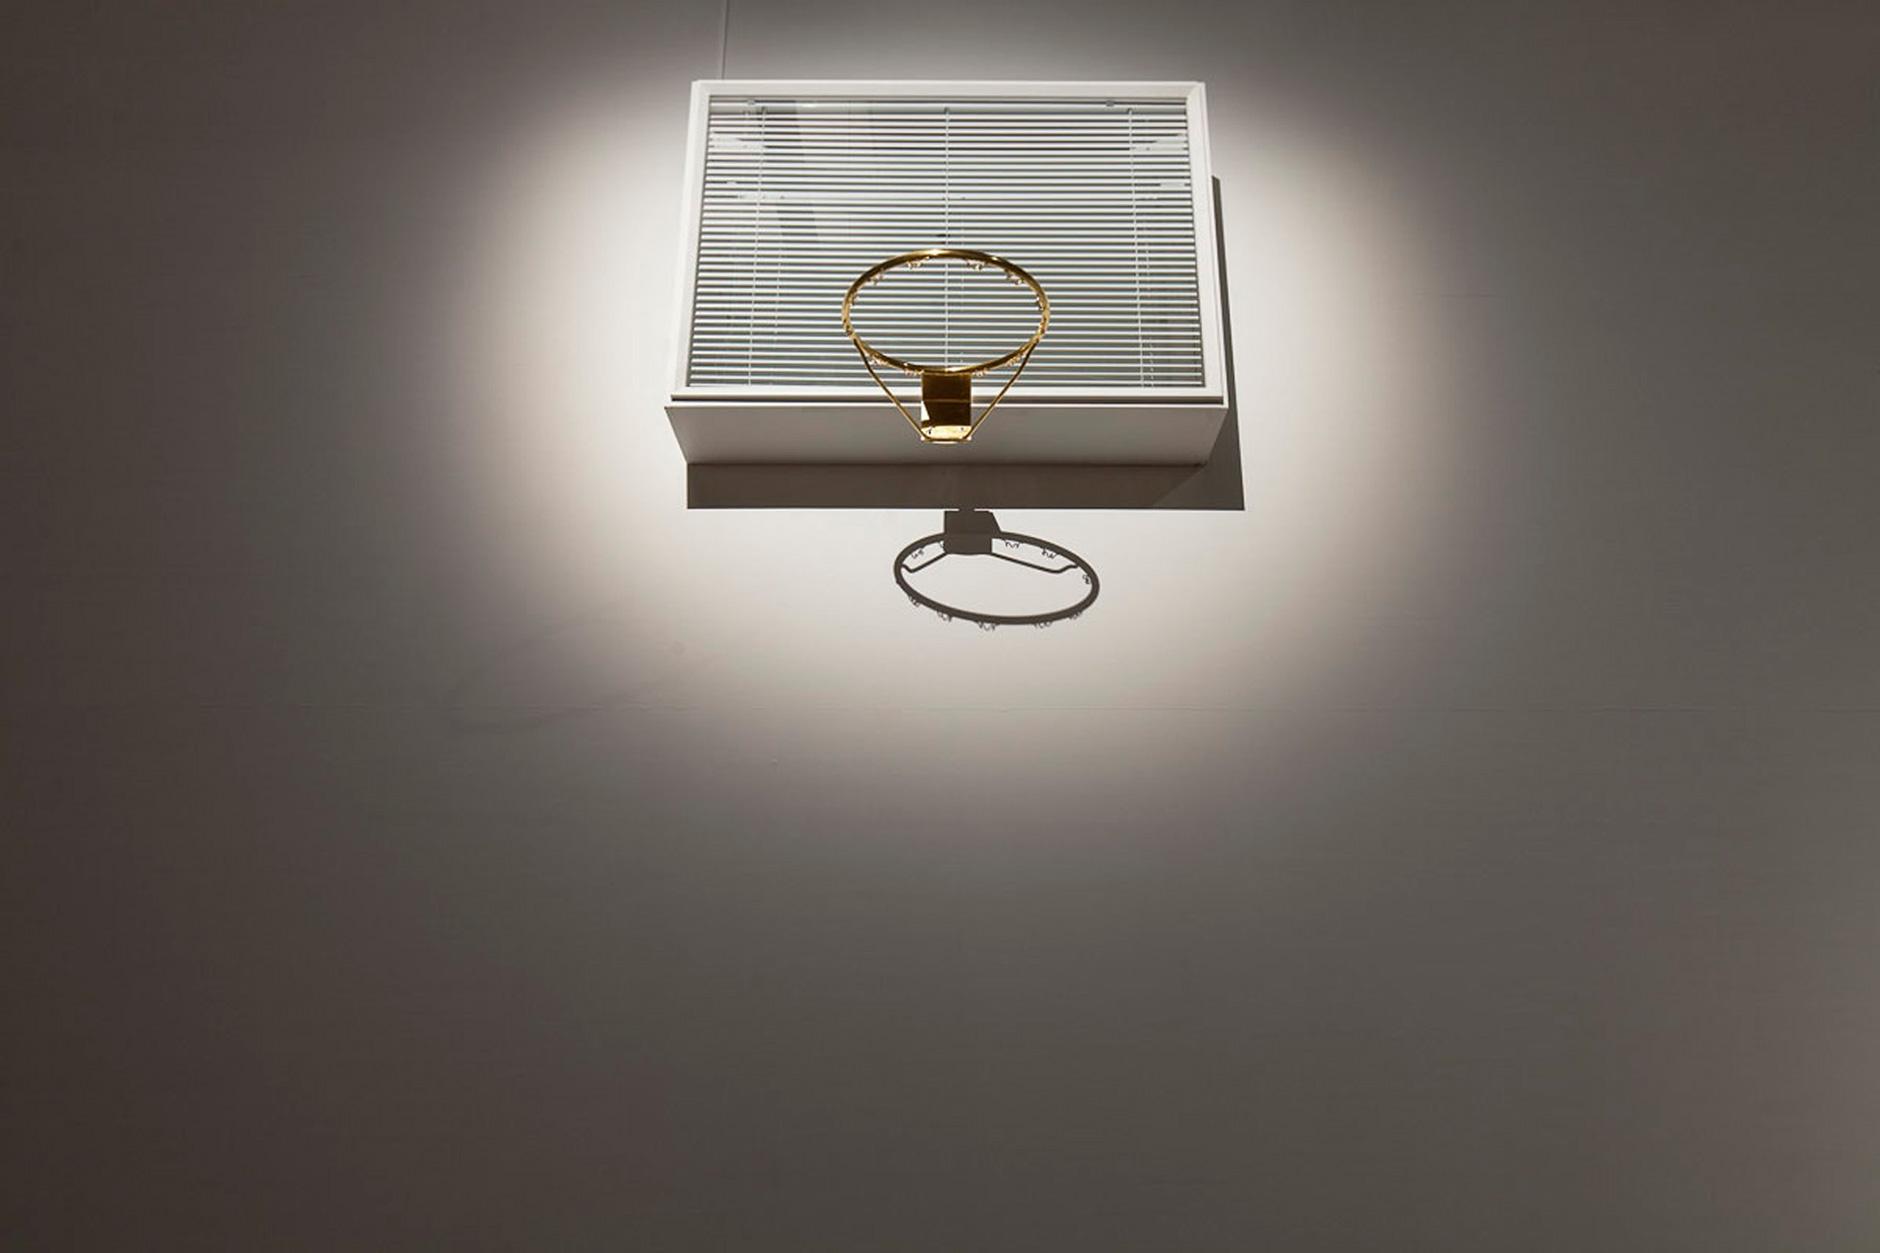 05-rebound-helsinki-art-museum-2014